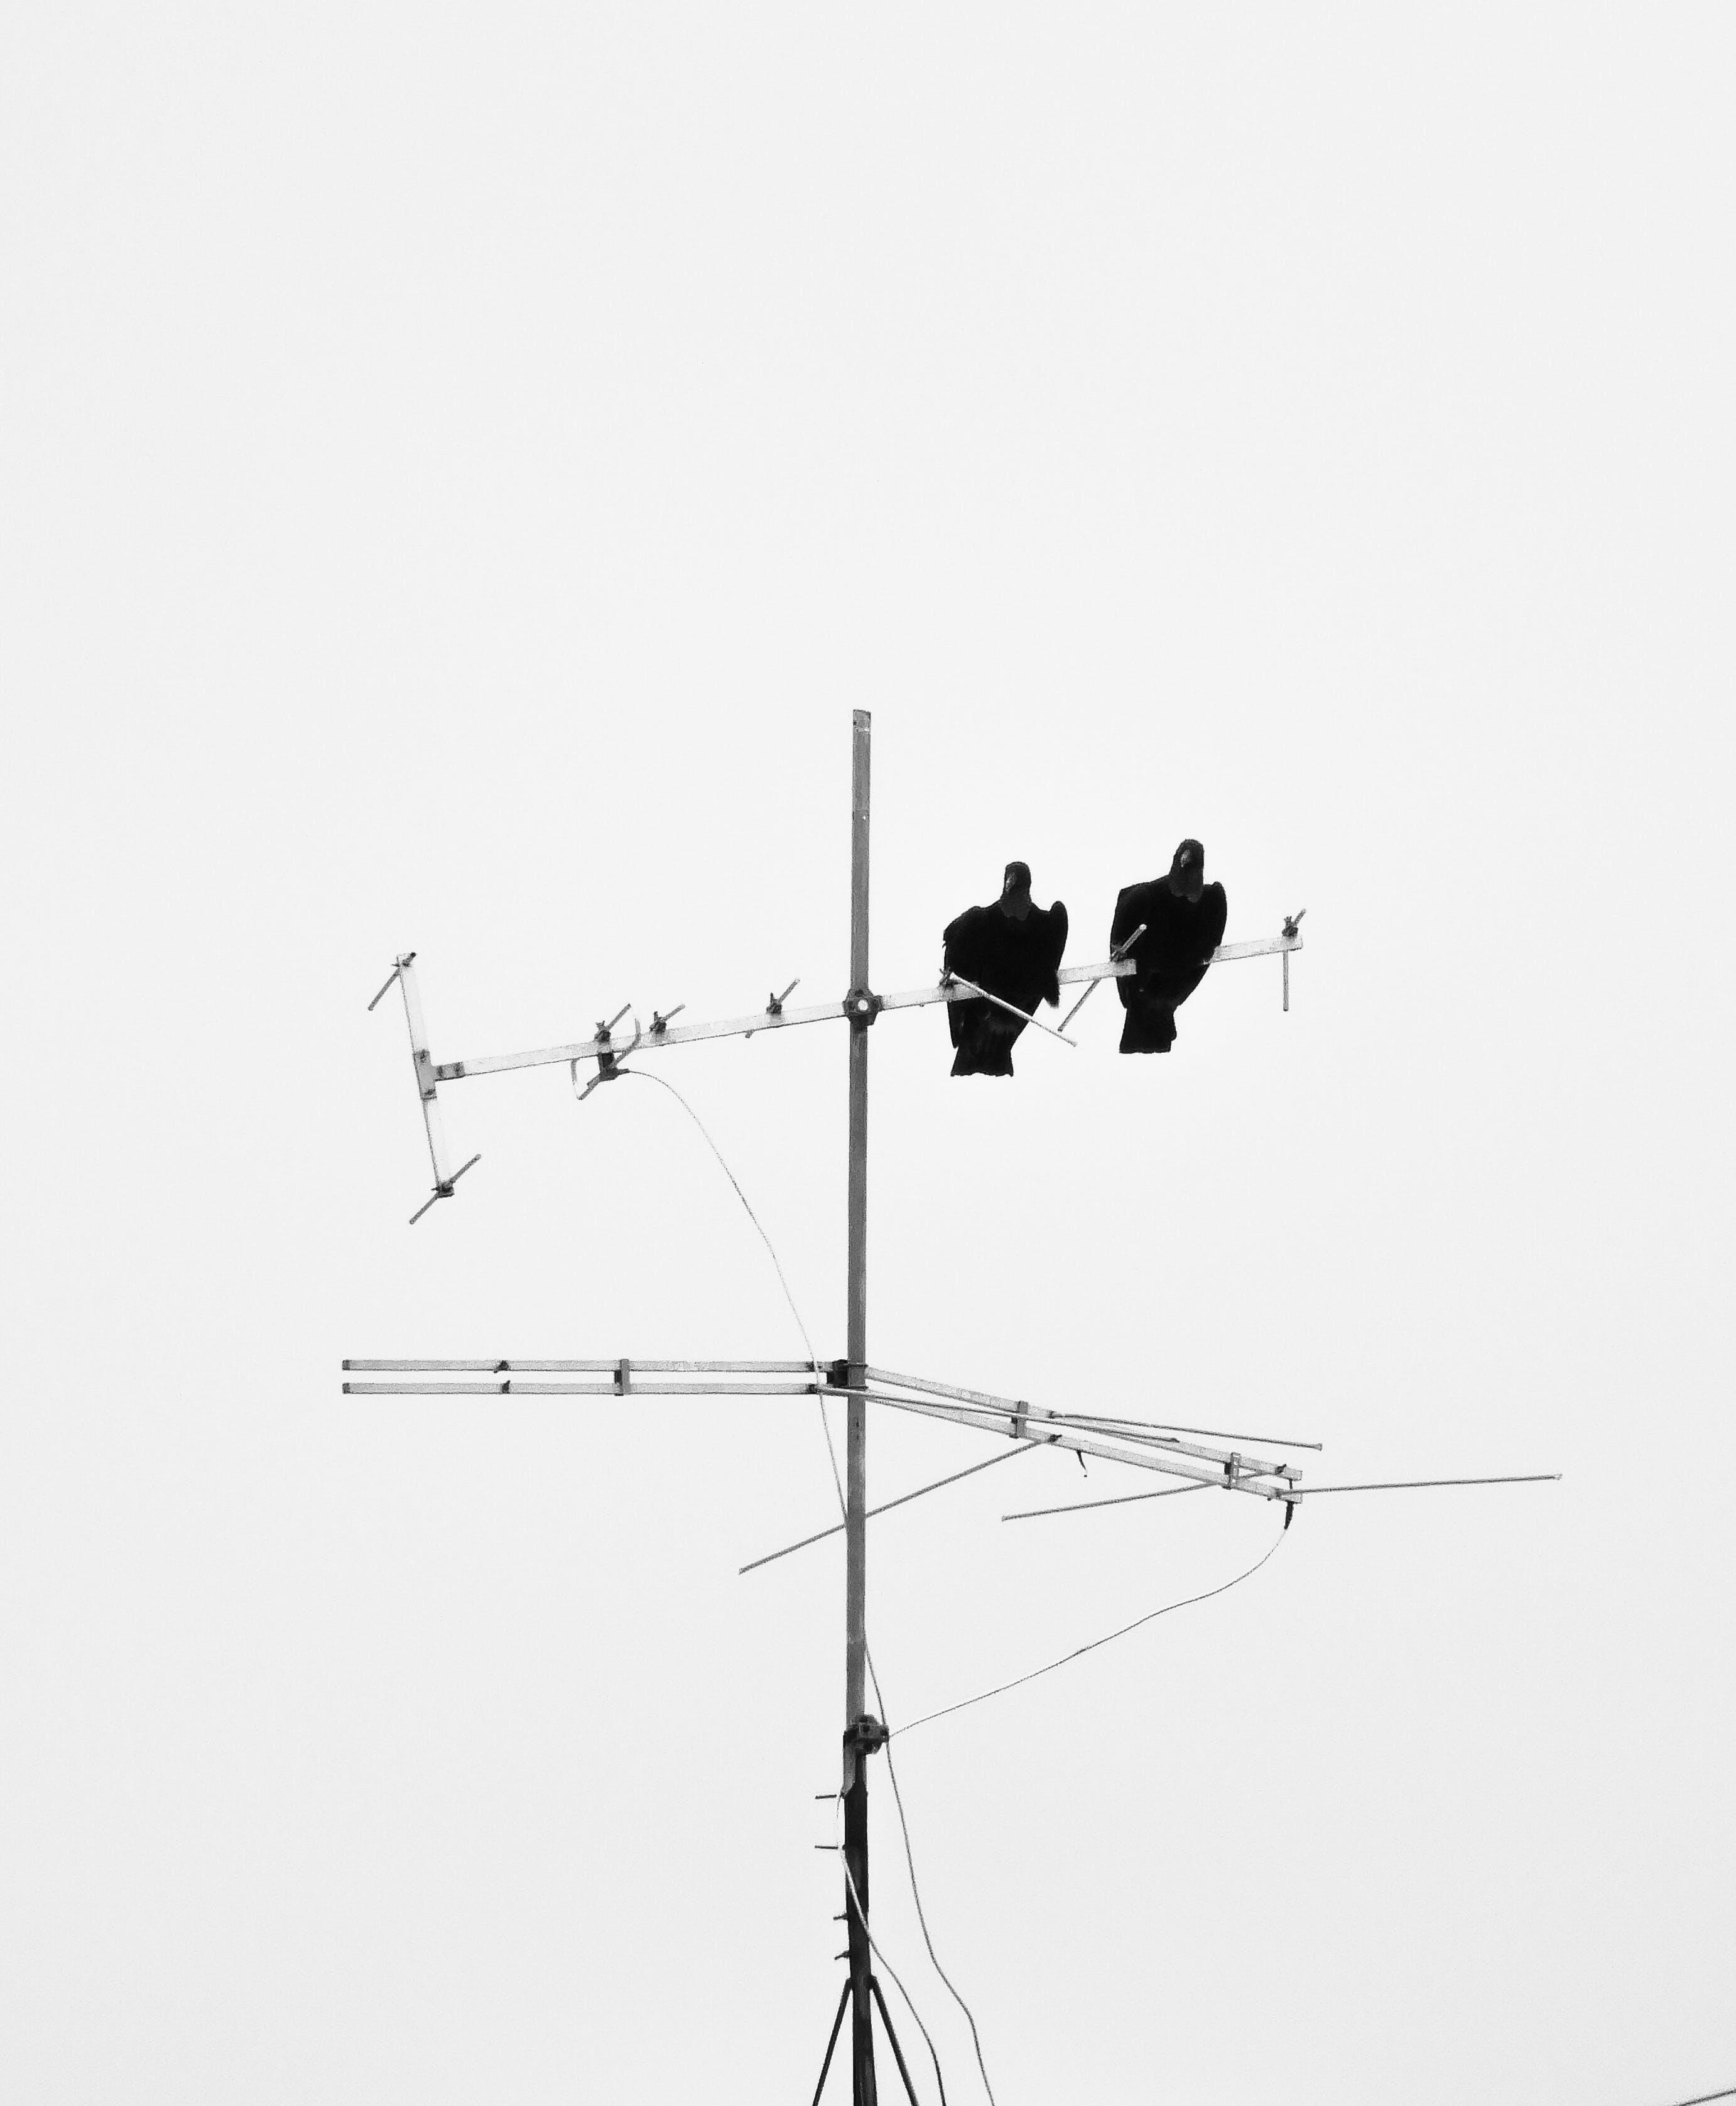 Black Birds Perched on Antenna